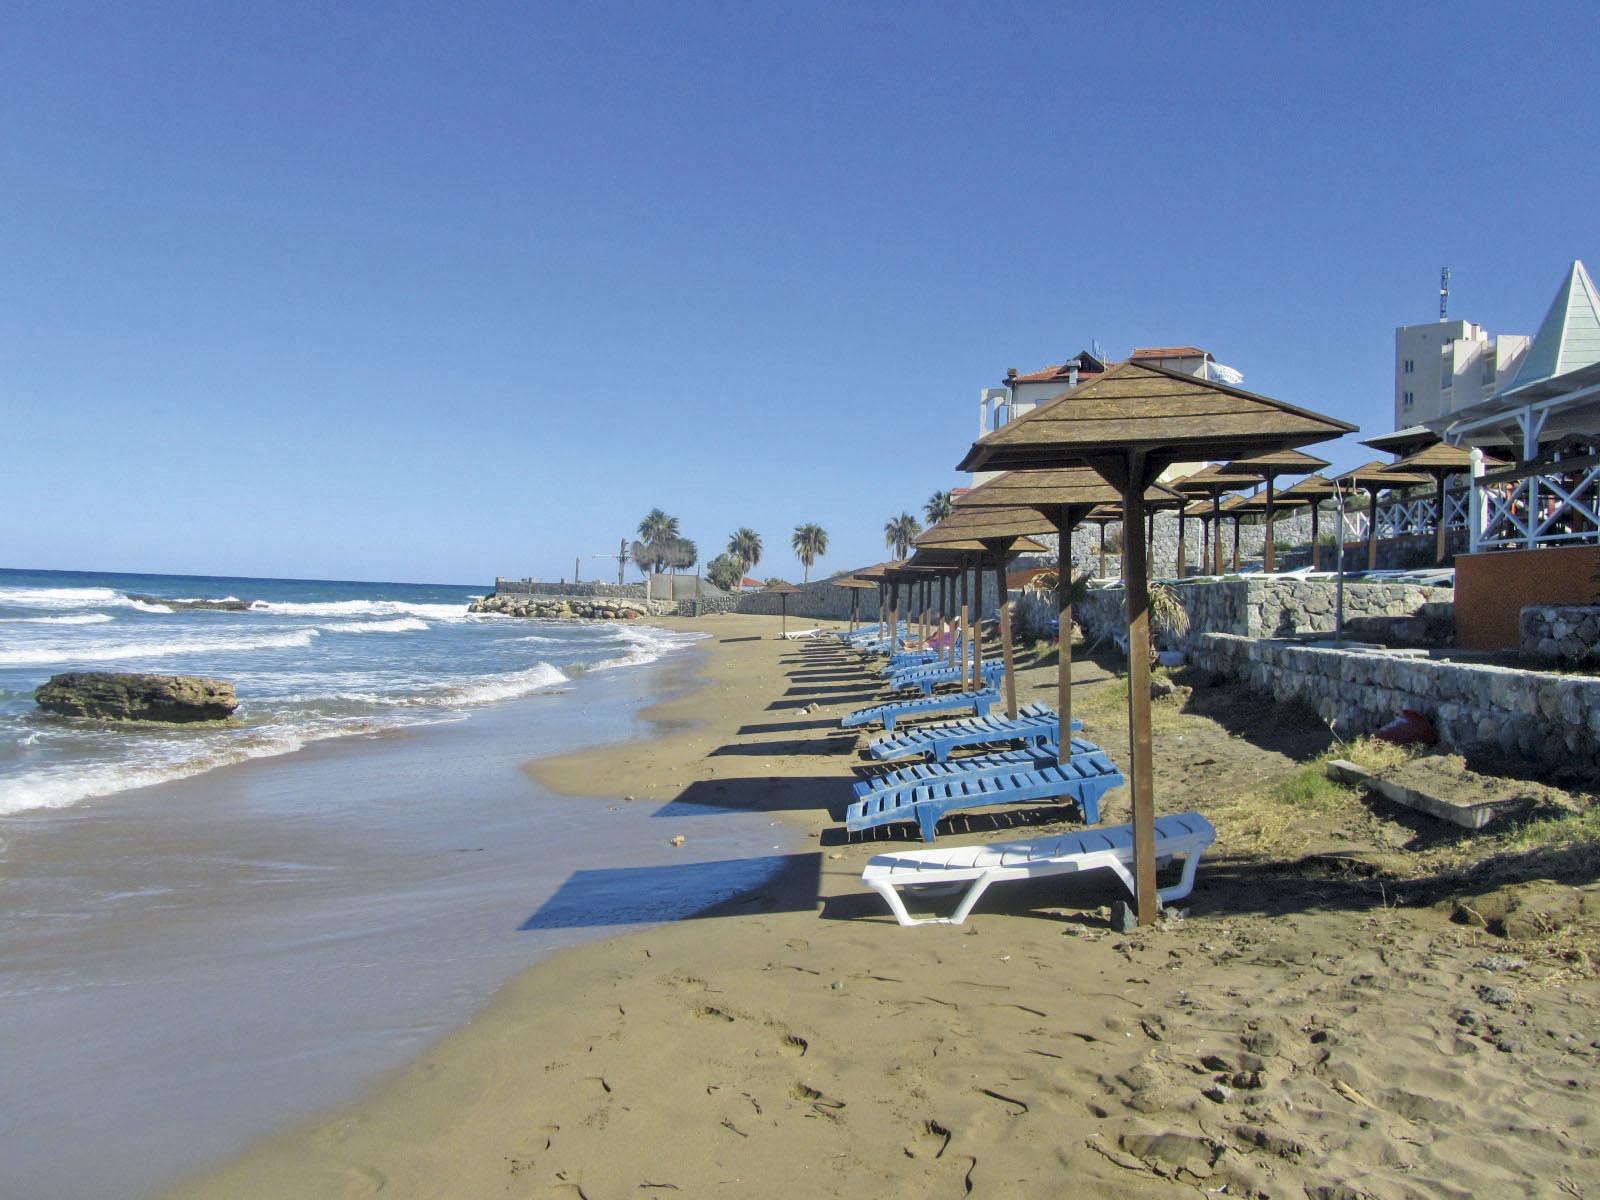 http://www.budavartours.hu/binaries//content/gallery/budavar/locations/accomodations/Ciprus/Kyrenia/L.A.+Beach+Resort/la_beach_resort_kyrenia_part.jpg